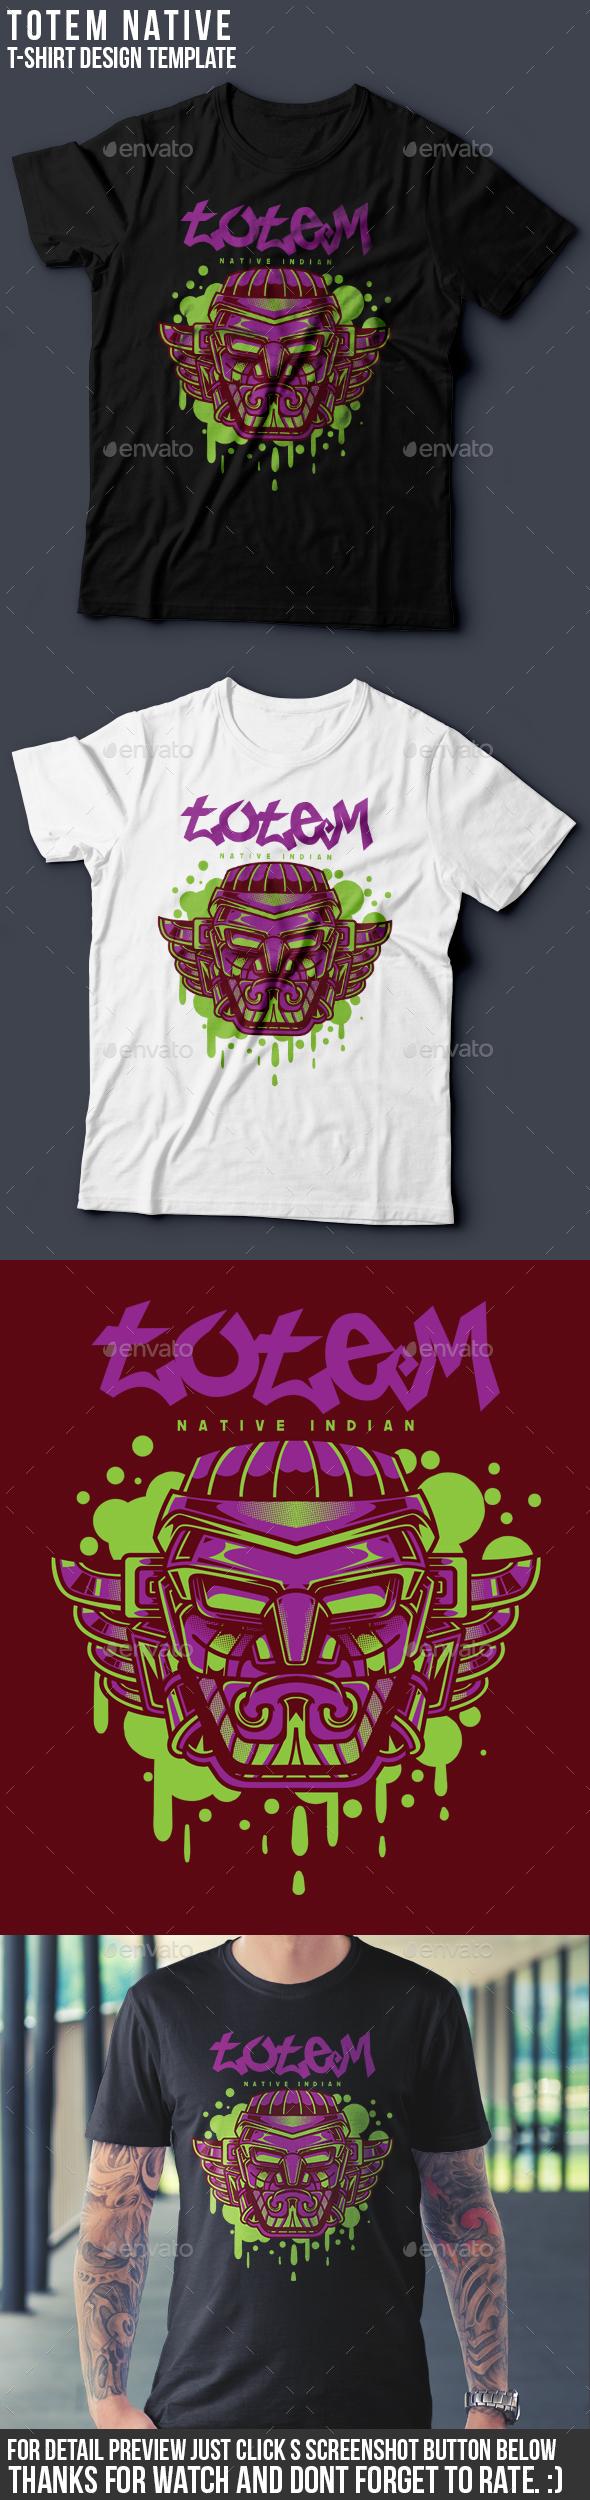 Totem T-Shirt Design - Clean Designs